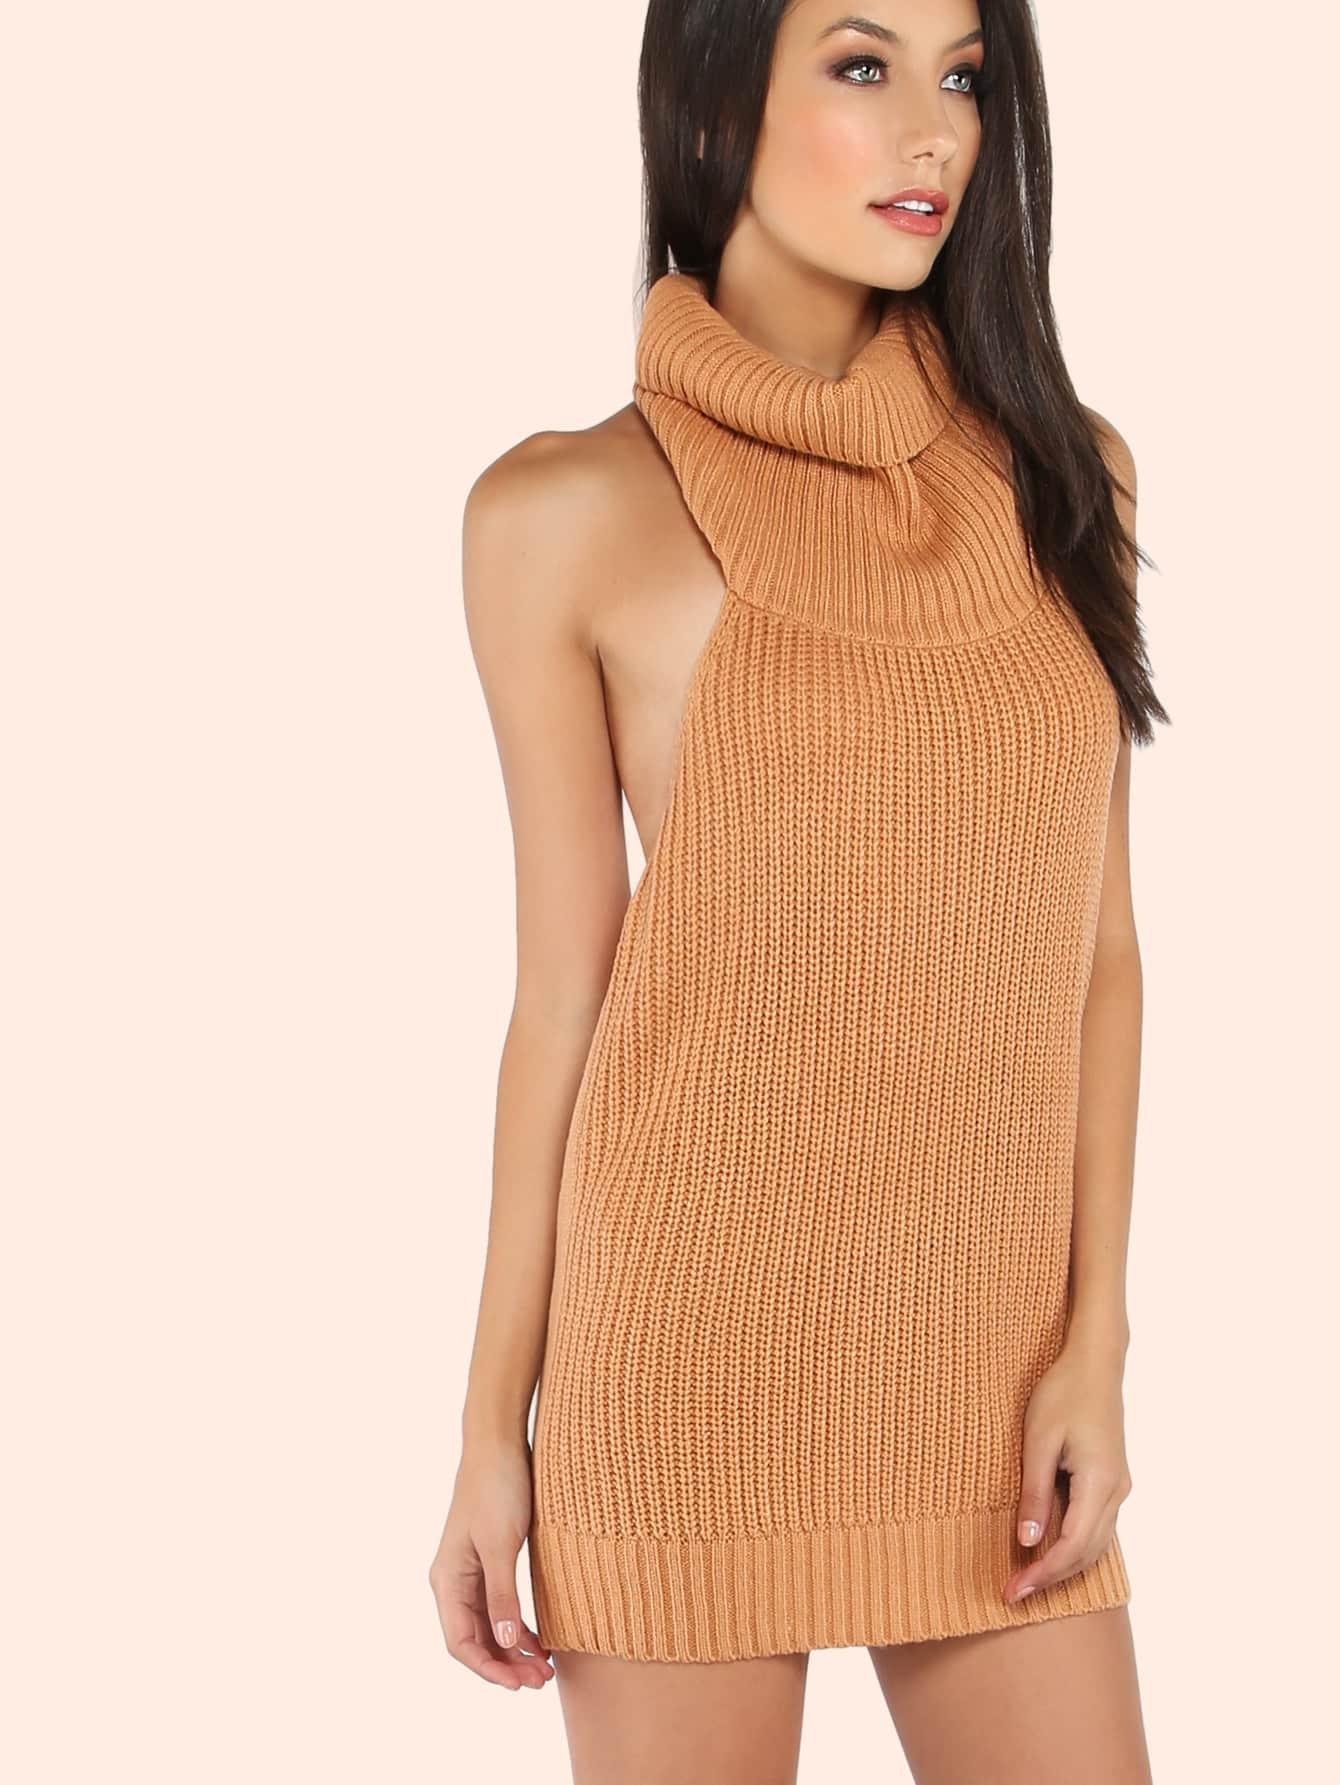 Low Back Cowl Neck Mini Sweater Dress TAN -SheIn(Sheinside)